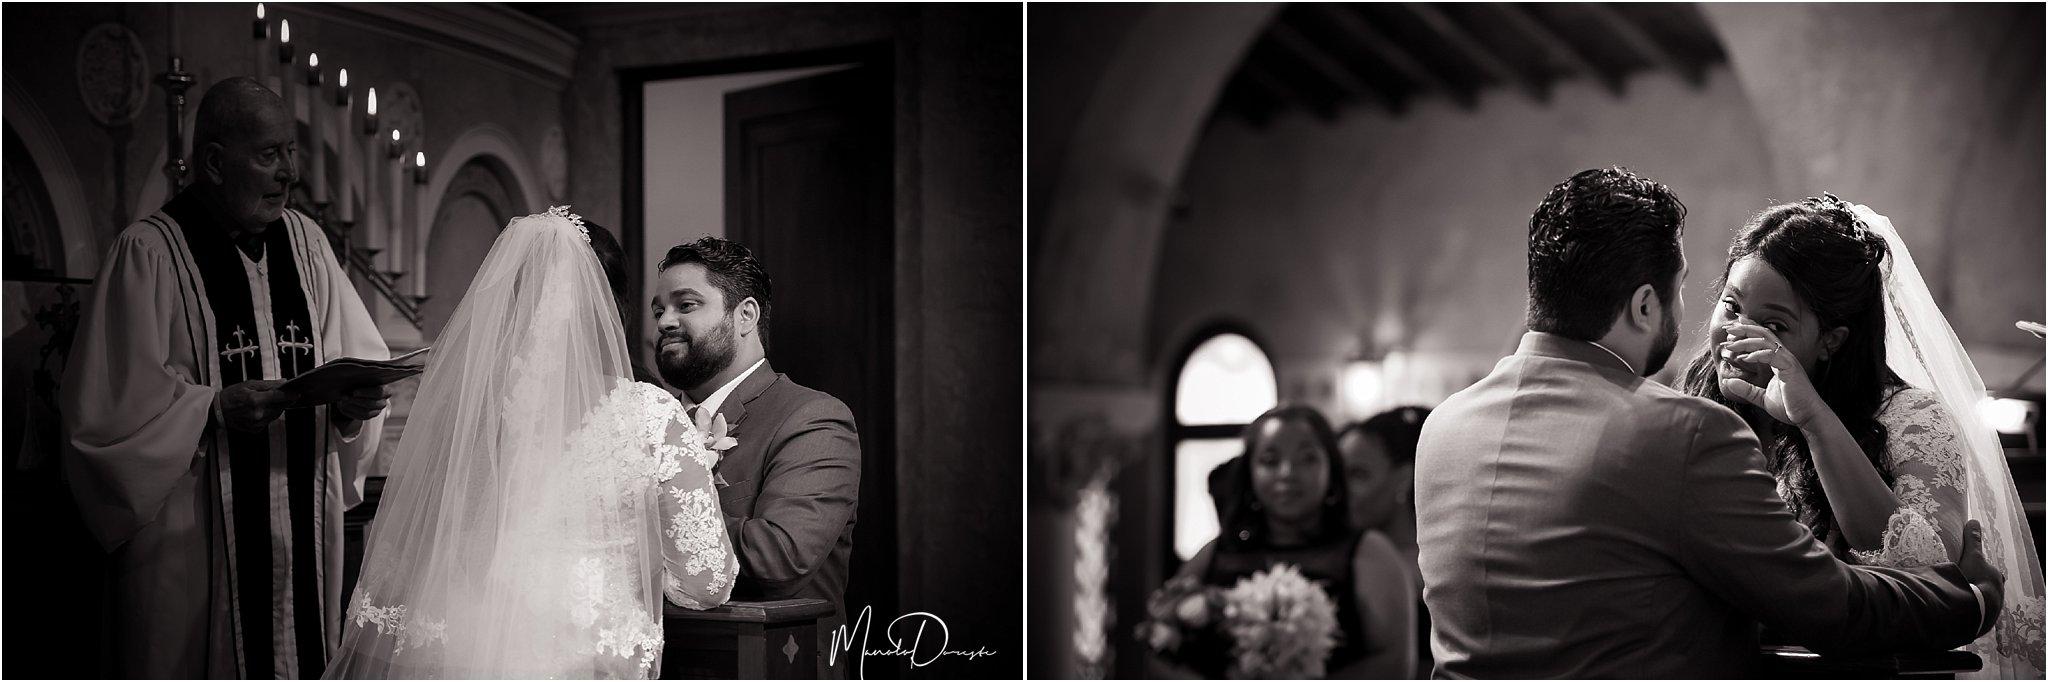 0423_ManoloDoreste_InFocusStudios_Wedding_Family_Photography_Miami_MiamiPhotographer.jpg